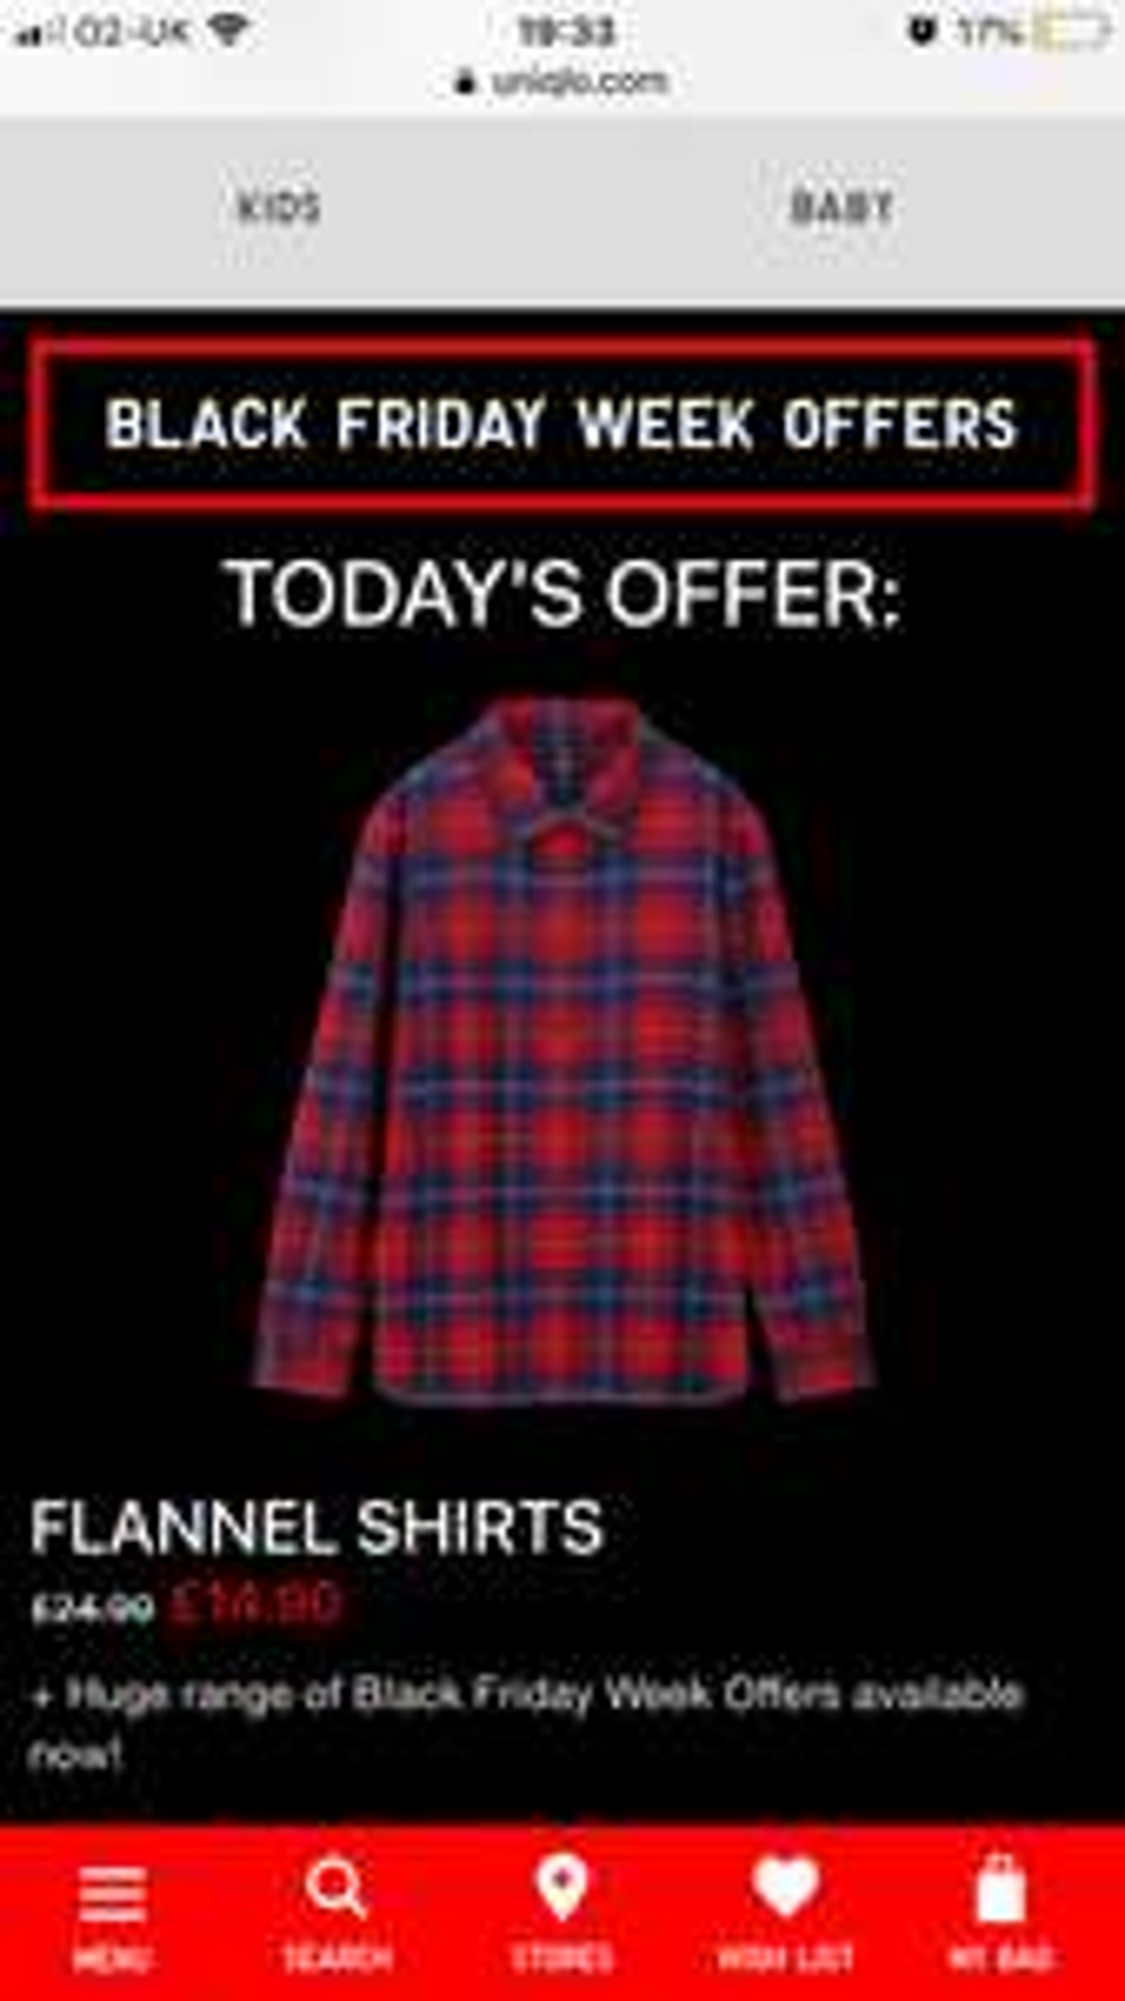 Uniqlo Black Friday days offer - Flannel Shirts £14.90